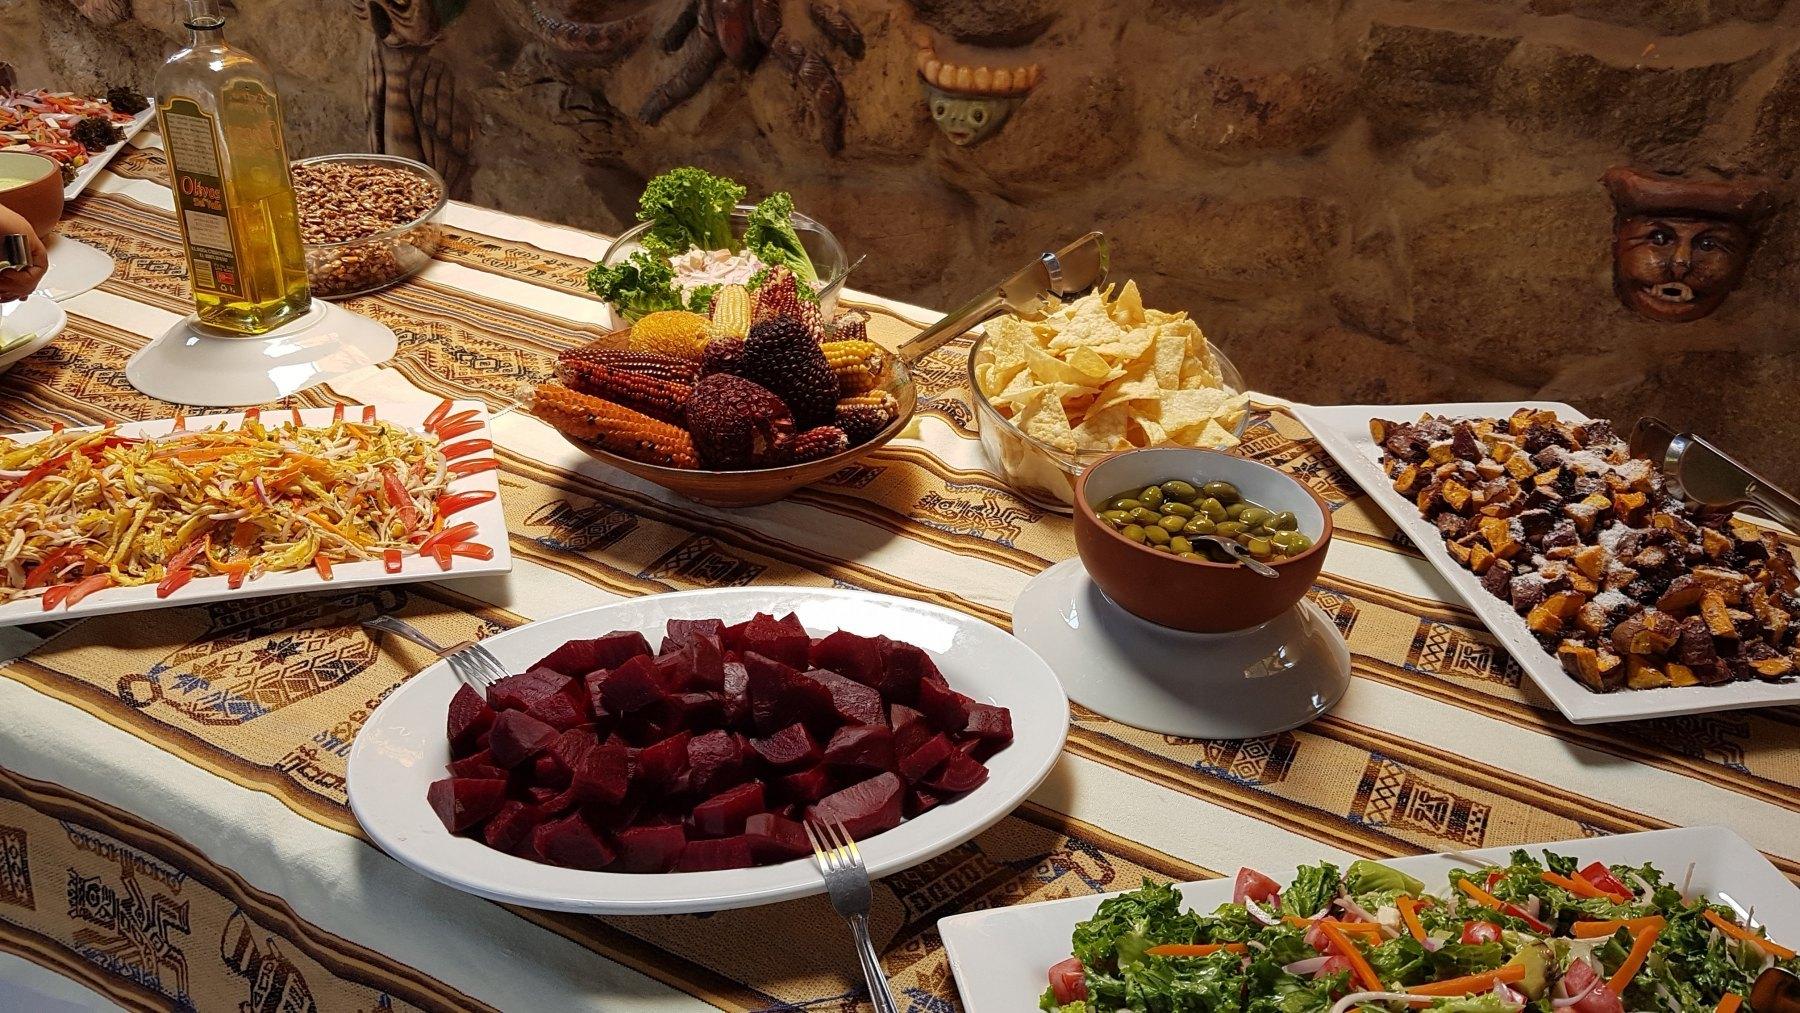 Raut - peruánská kuchyně